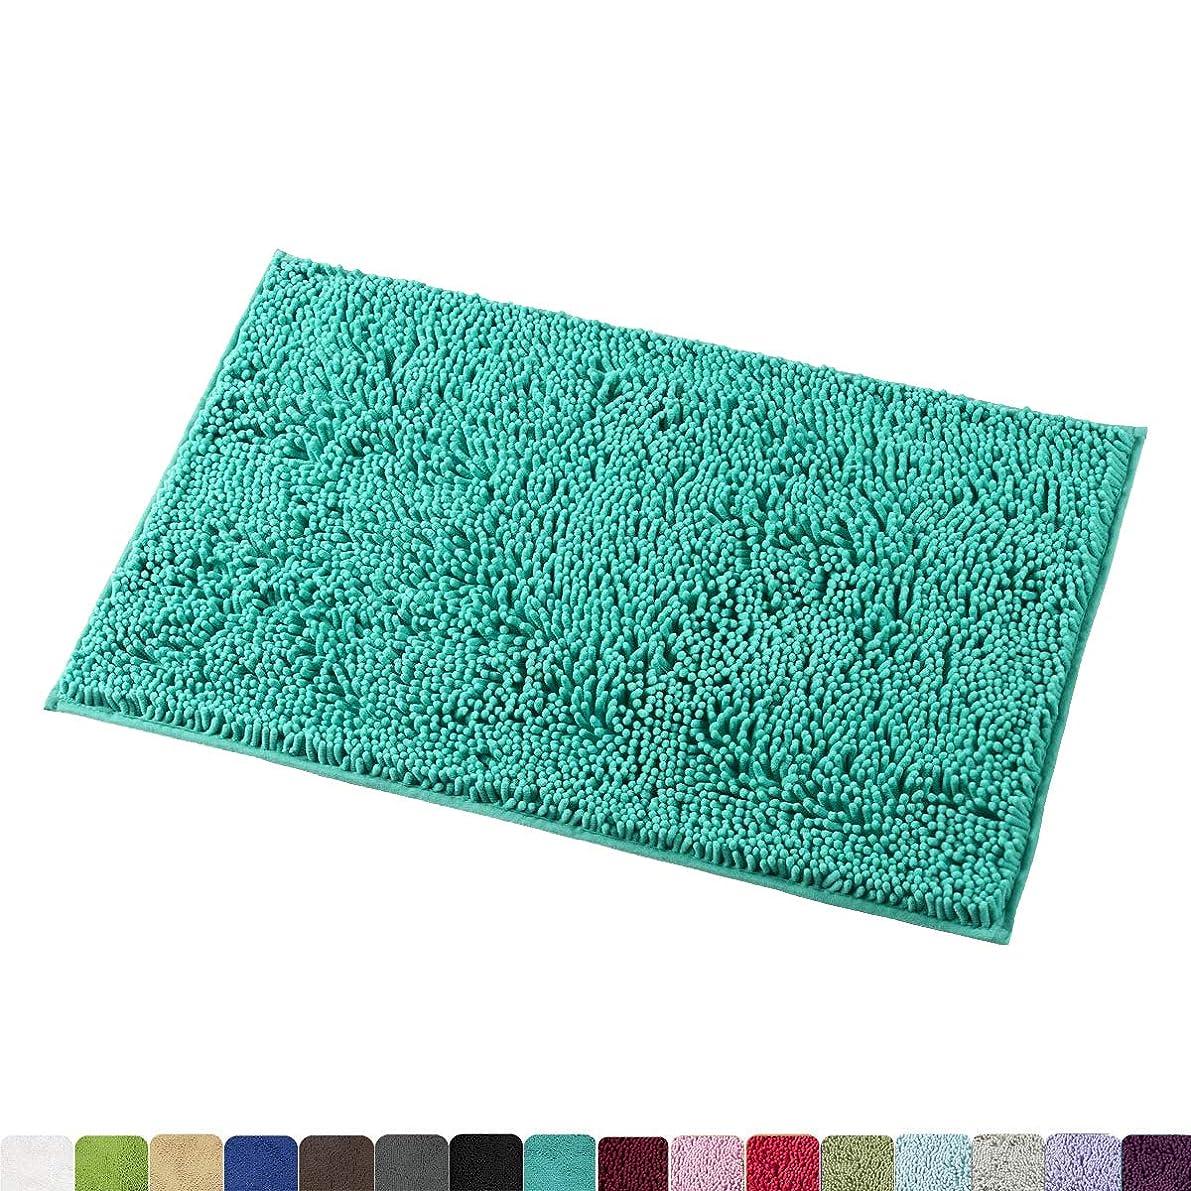 MAYSHINE Non-Slip Bathroom Rug Shag Shower Mat Machine-Washable Bath Mats with Water Absorbent Soft Microfibers, 20